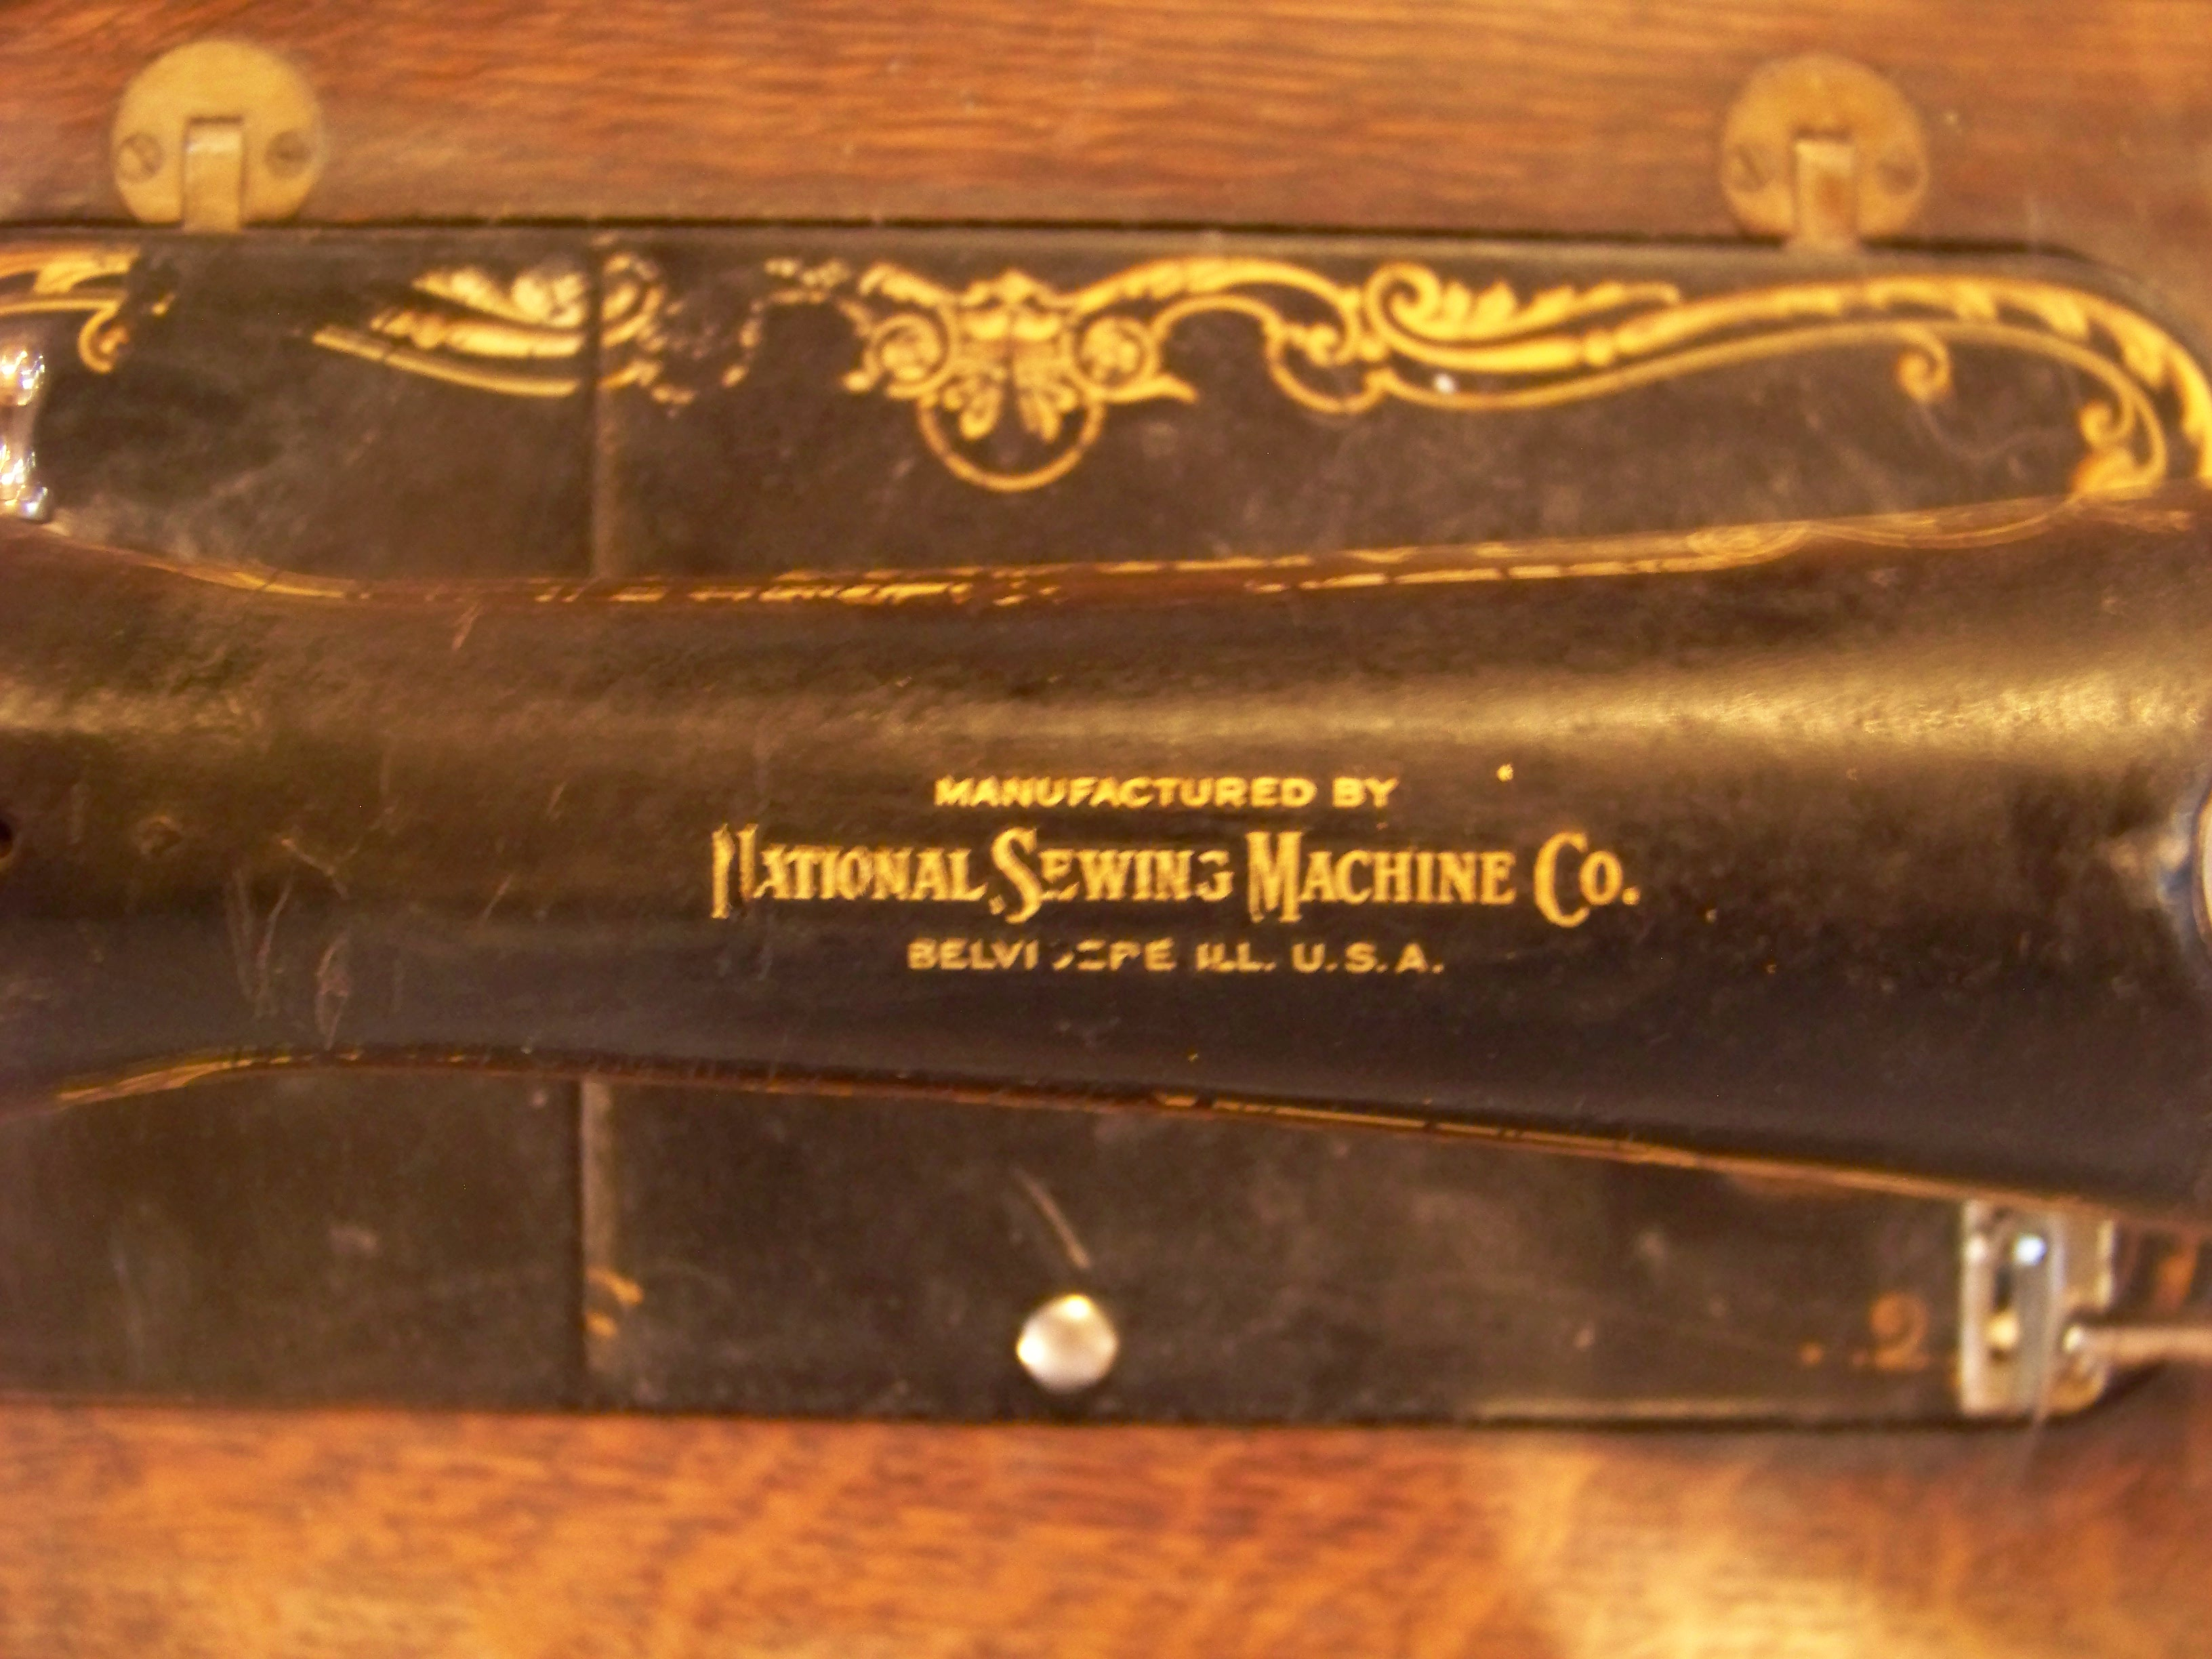 Name:  National Sewing Machine 027.JPG Views: 604 Size:  907.1 KB